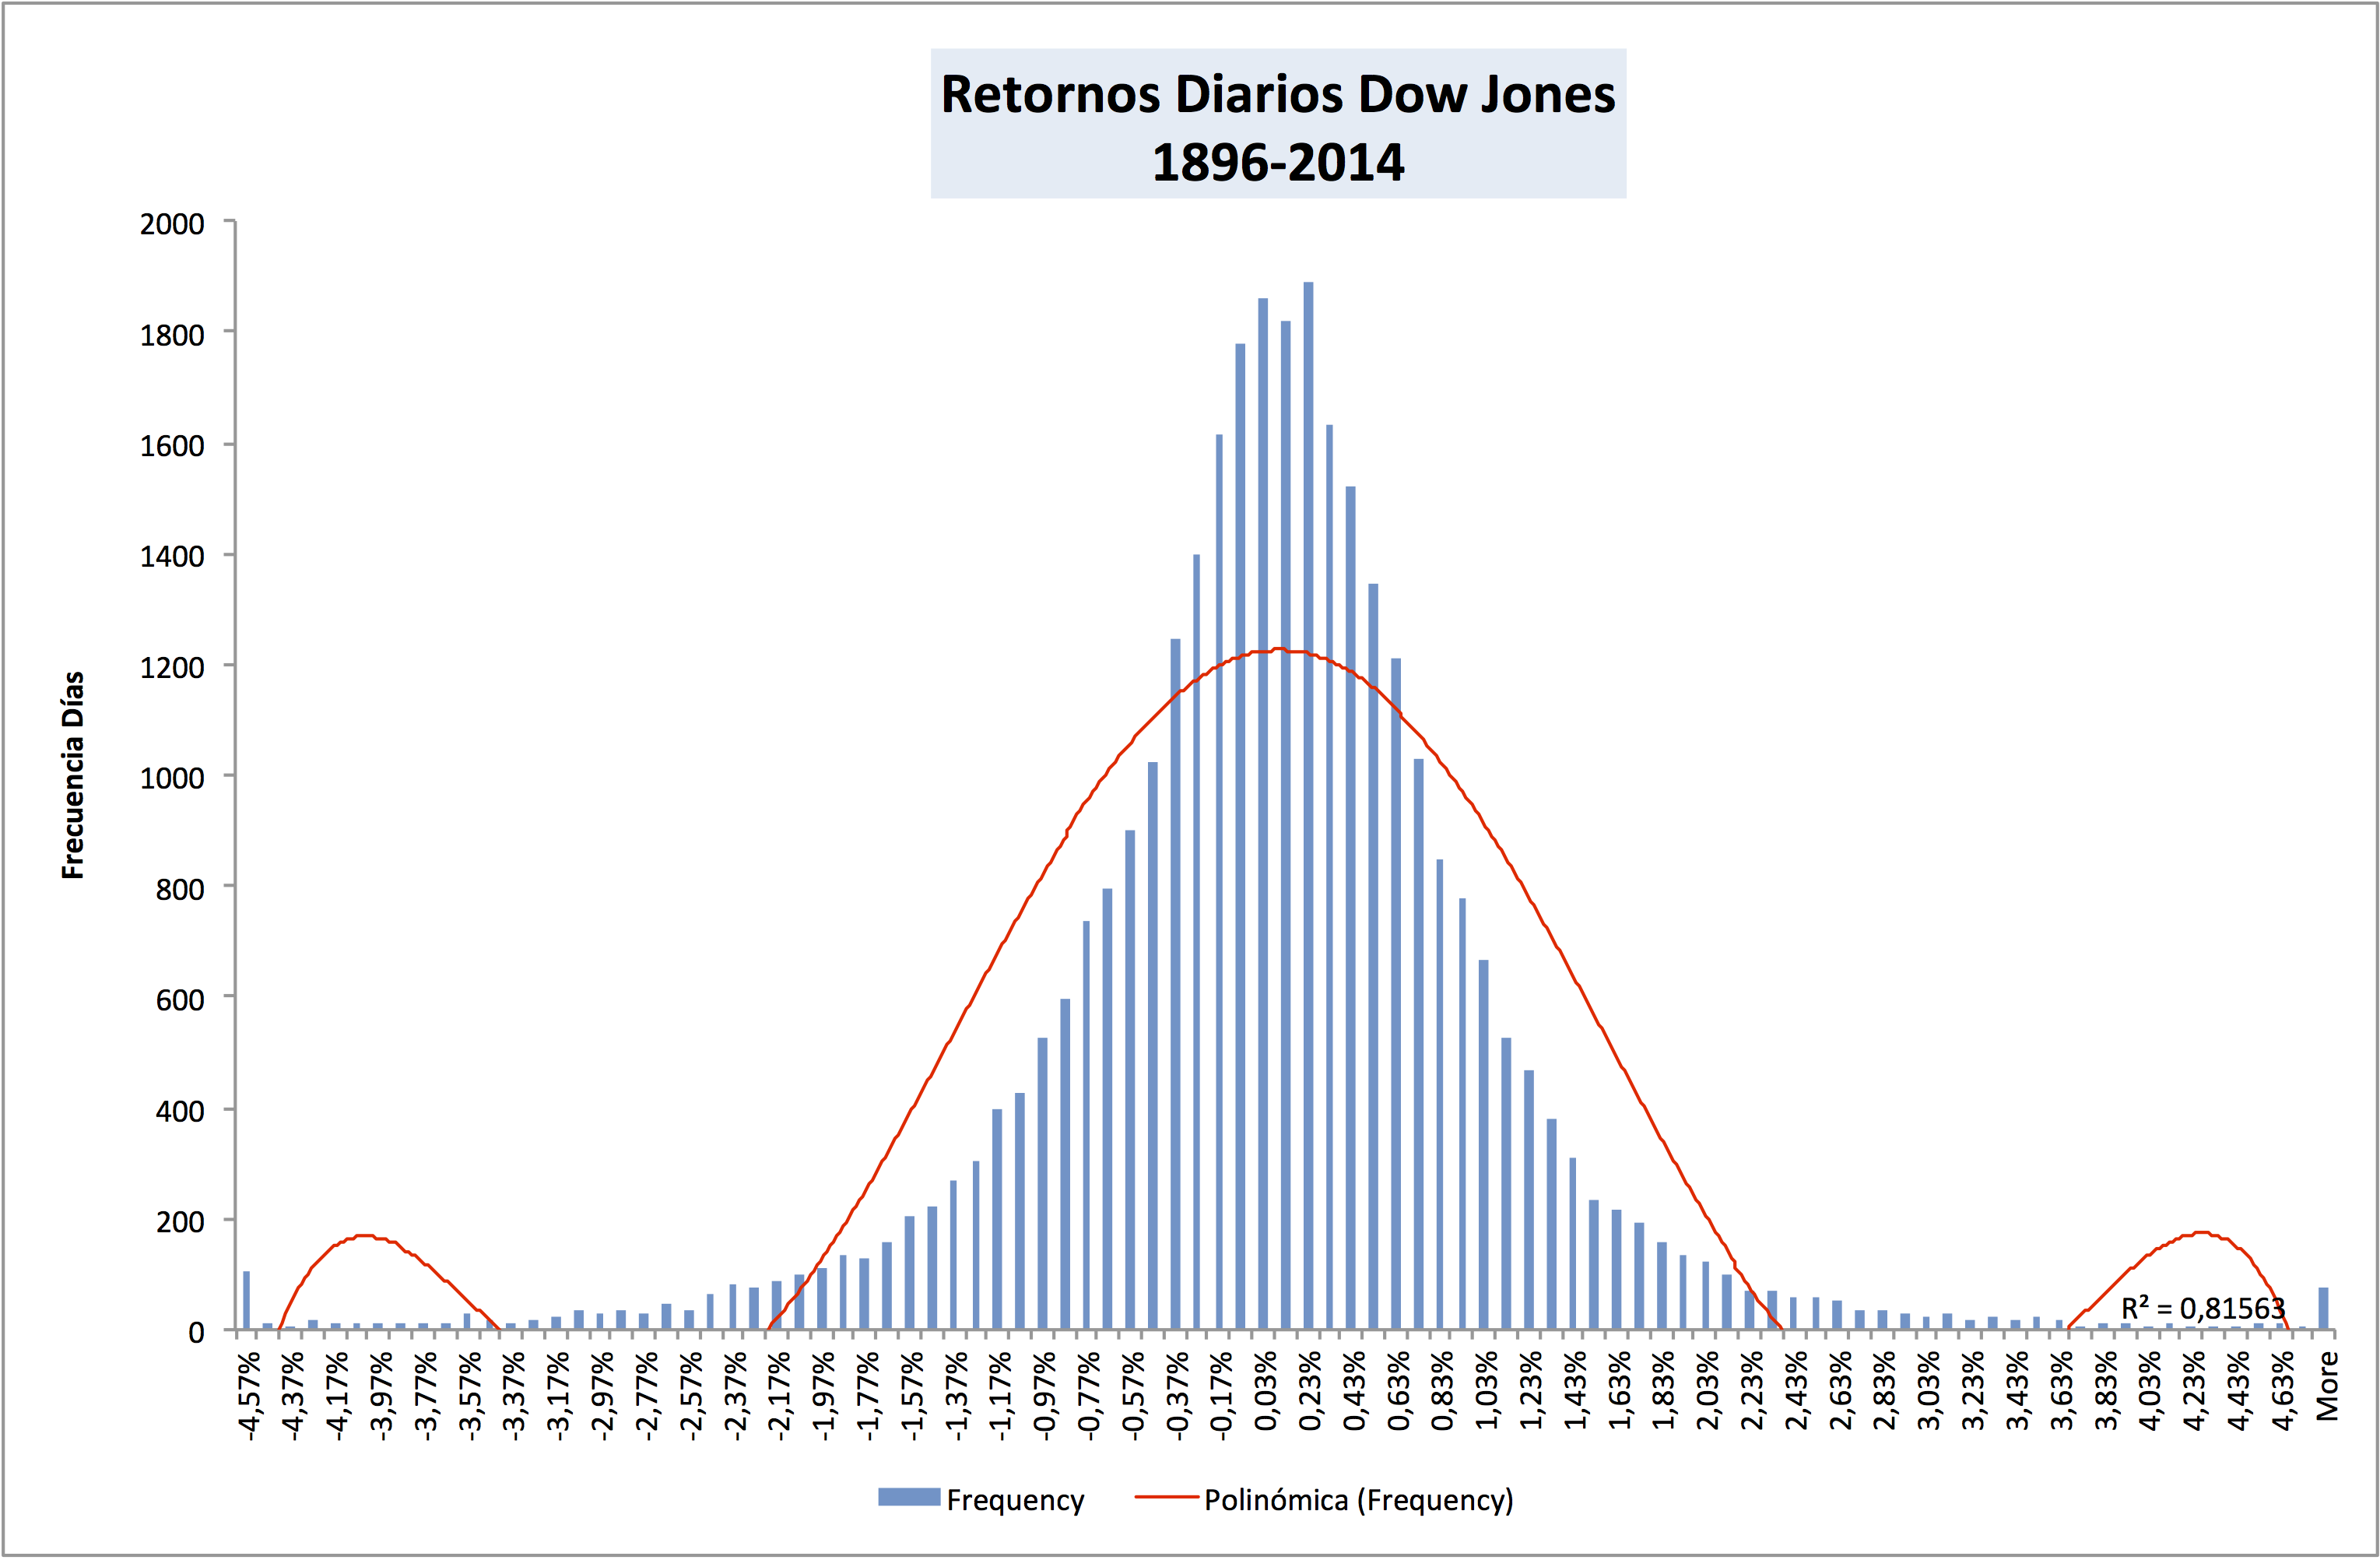 Dow%20jones%20distribuci%c3%b3n%20hist%c3%b3rica%20retornos%20diarios